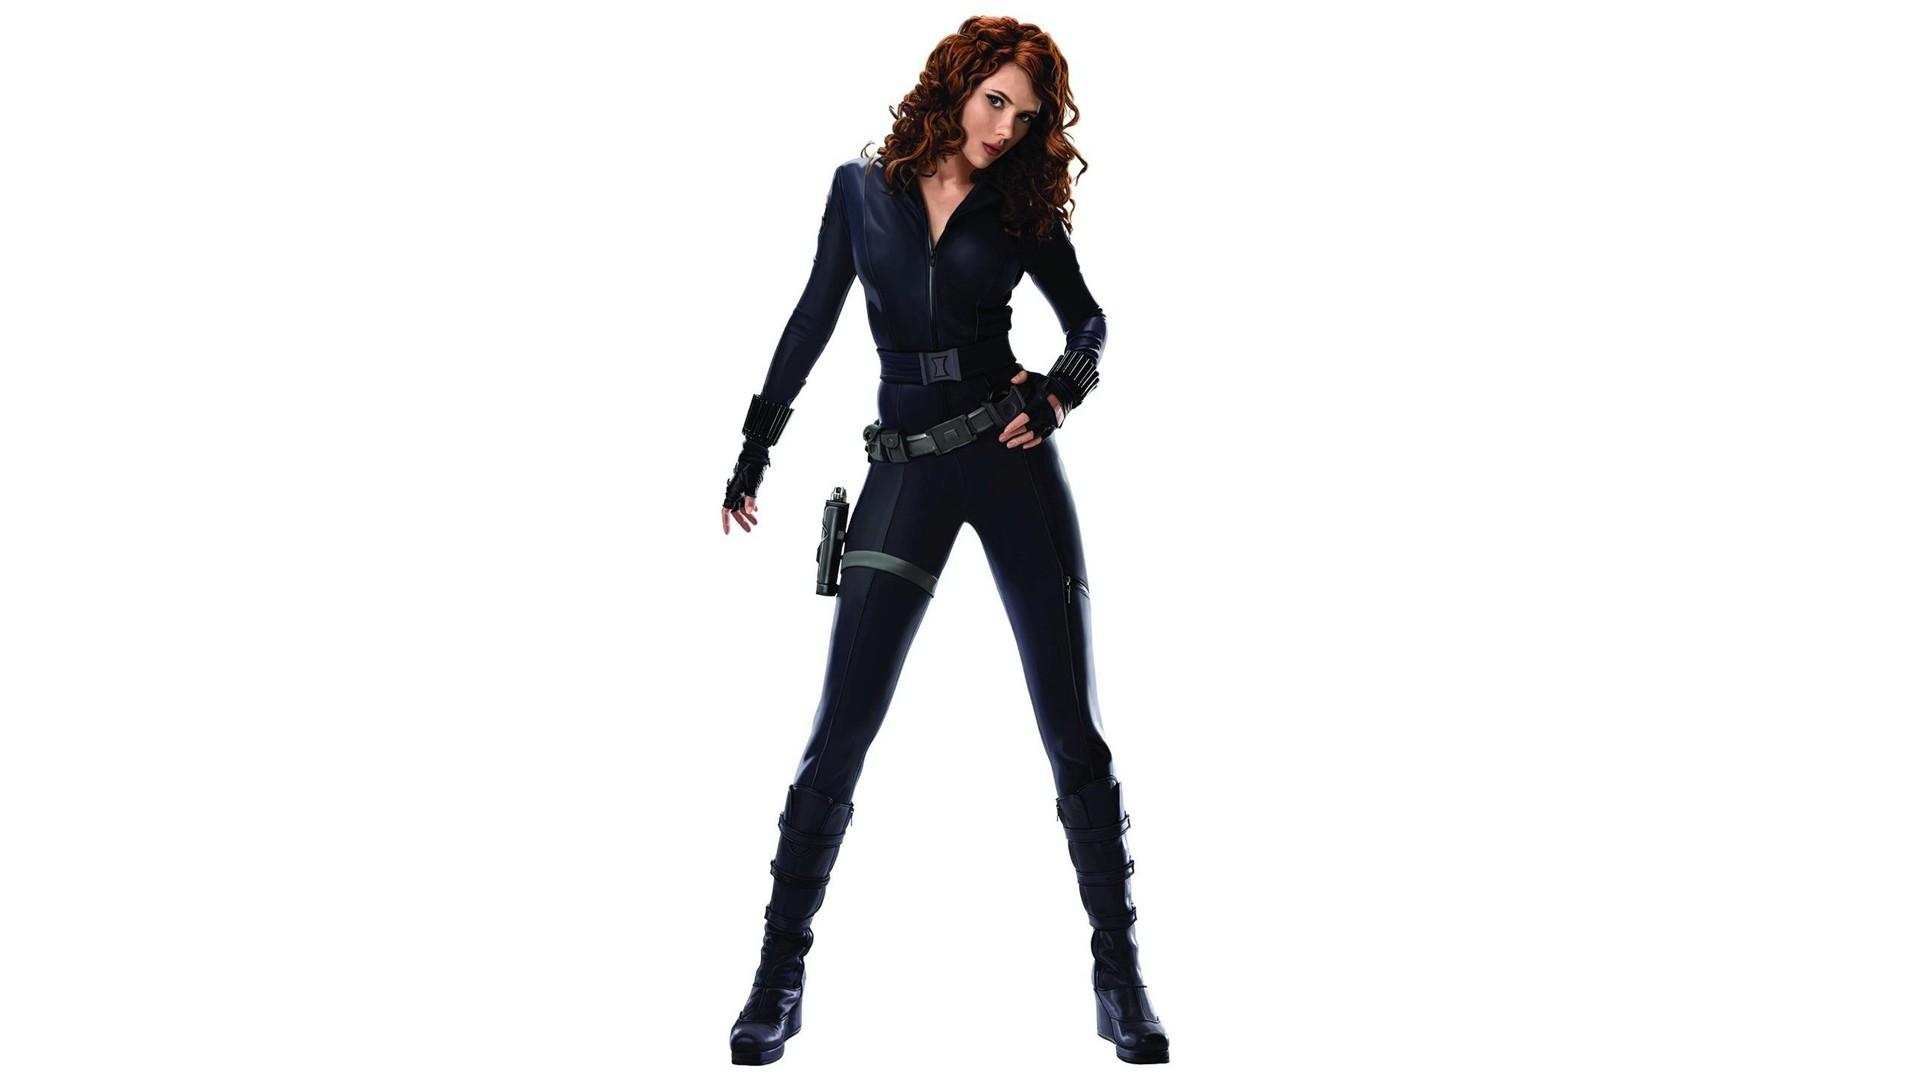 Johansson women actresses redheads Black Widow curly hair Iron Man 2 1920x1080